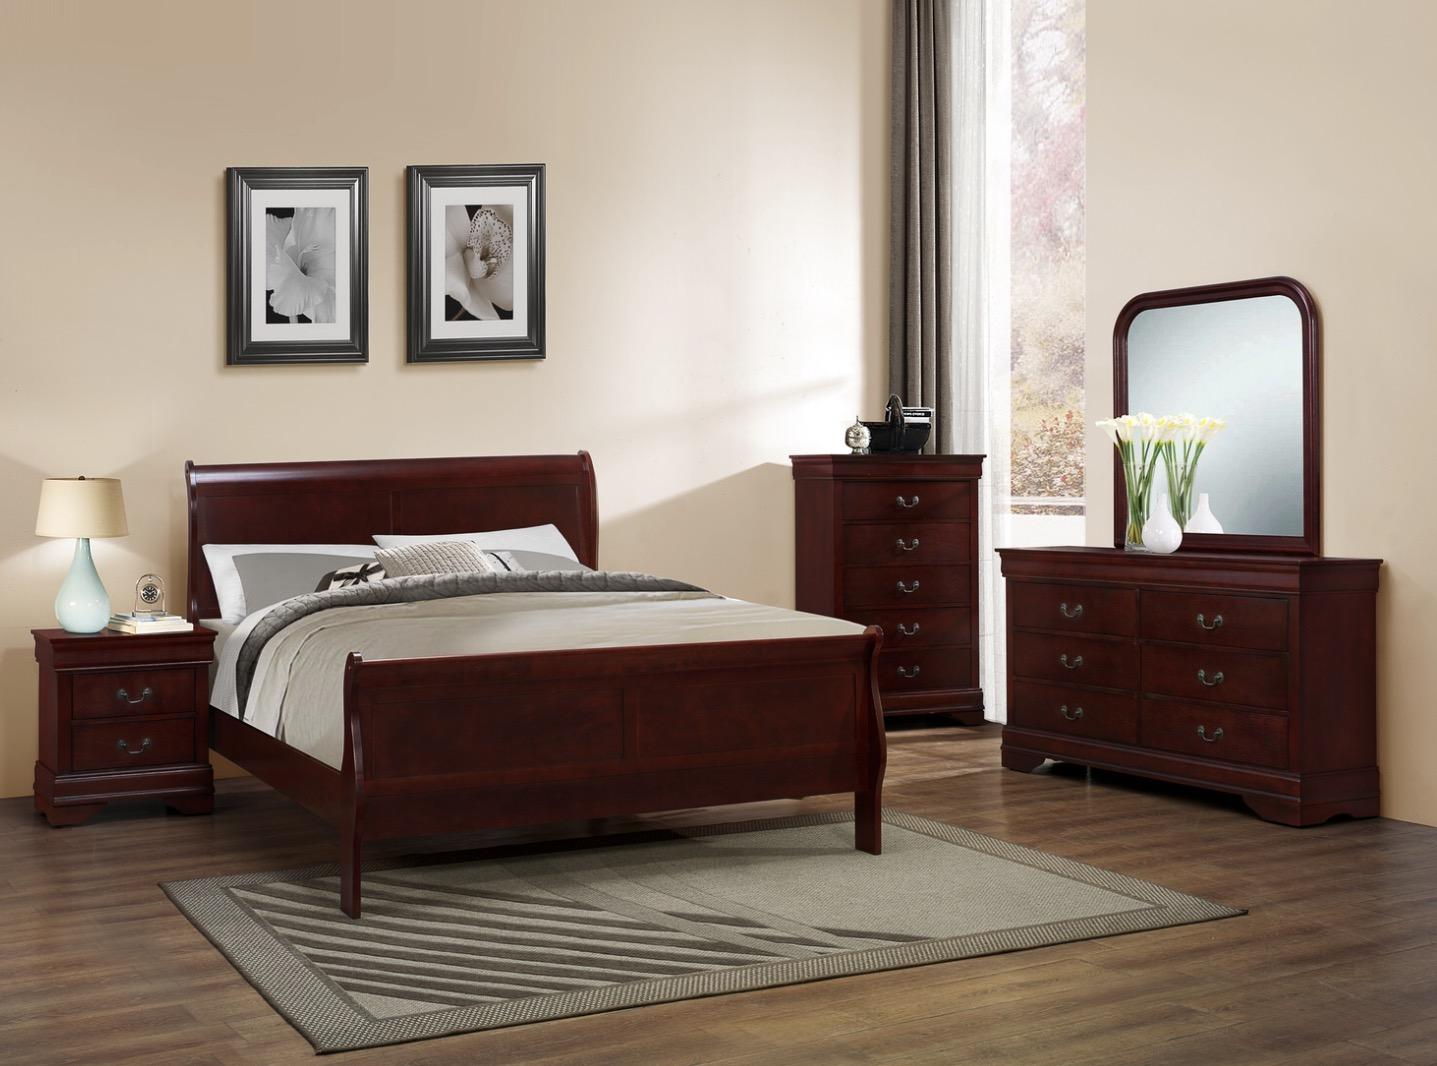 Louis Philippe 7pc Queen Bedroom Suite — HOTEL TO HOME - Hotel Surplus